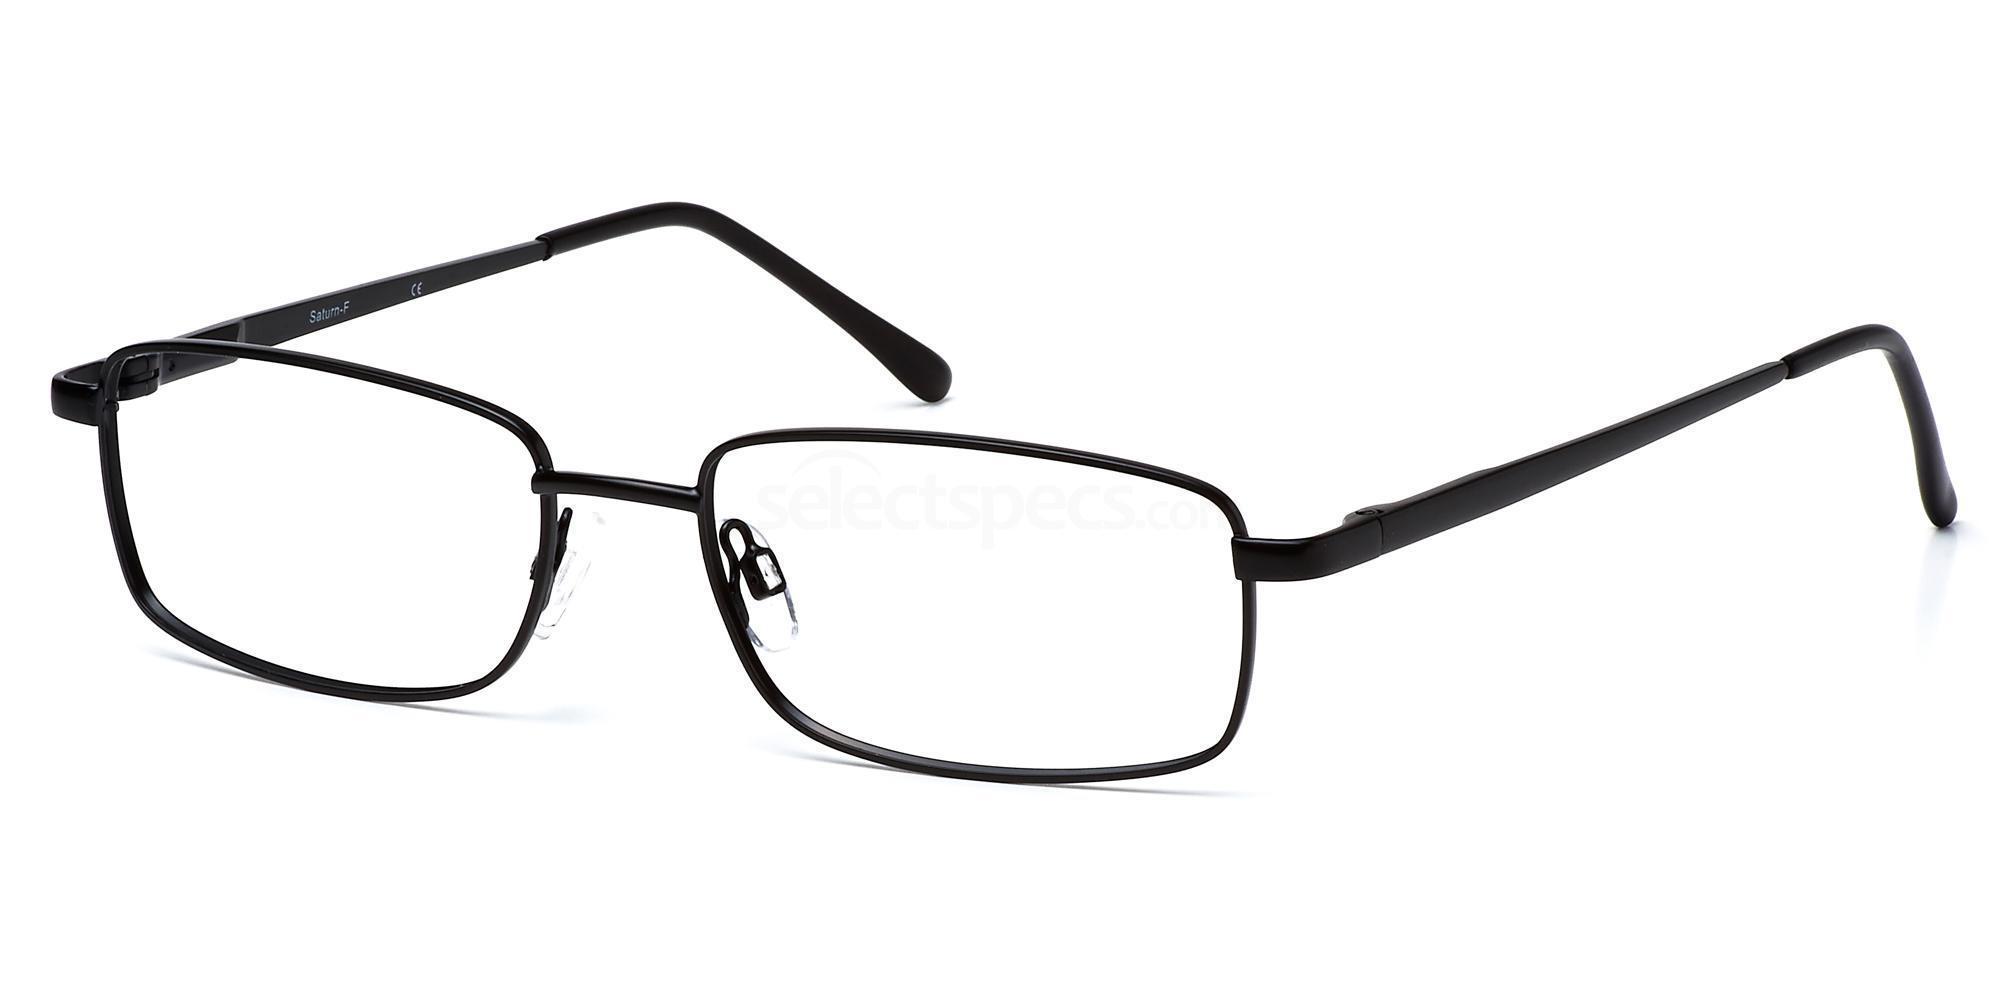 C1 SATF Glasses, Saturn